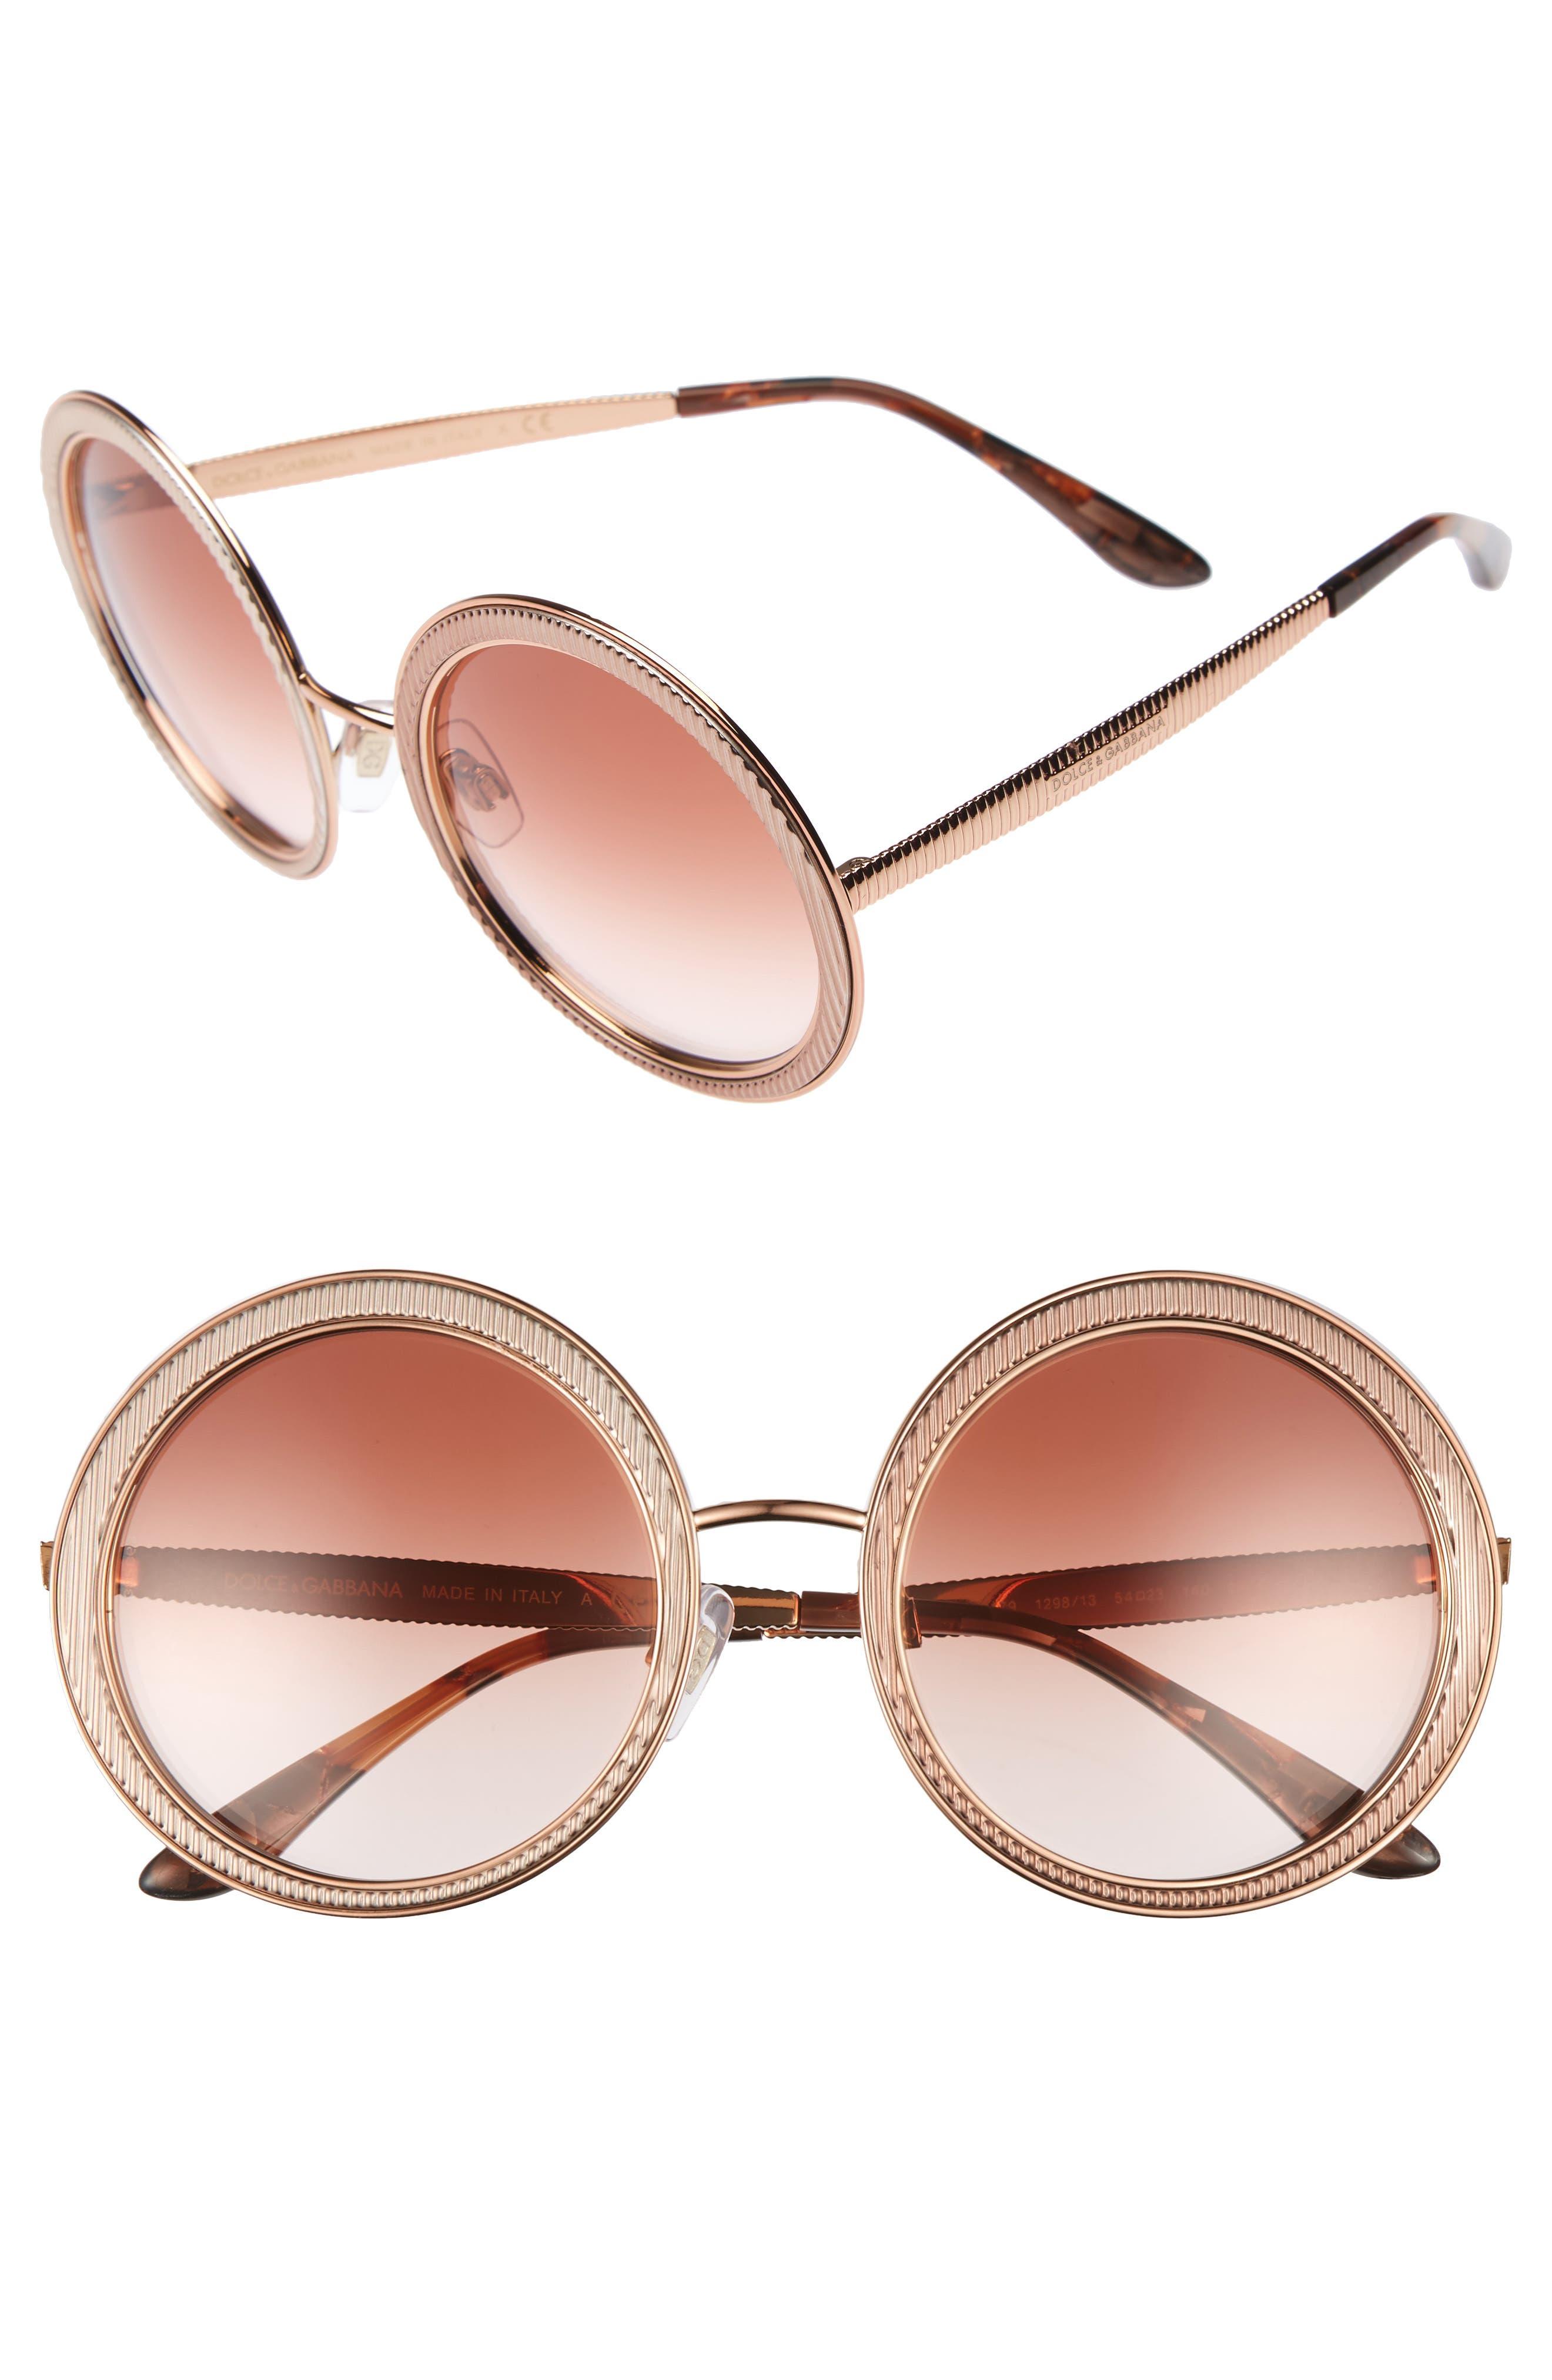 MDG Madonna for Dolce&Gabbana 54mm Gradient Round Sunglasses